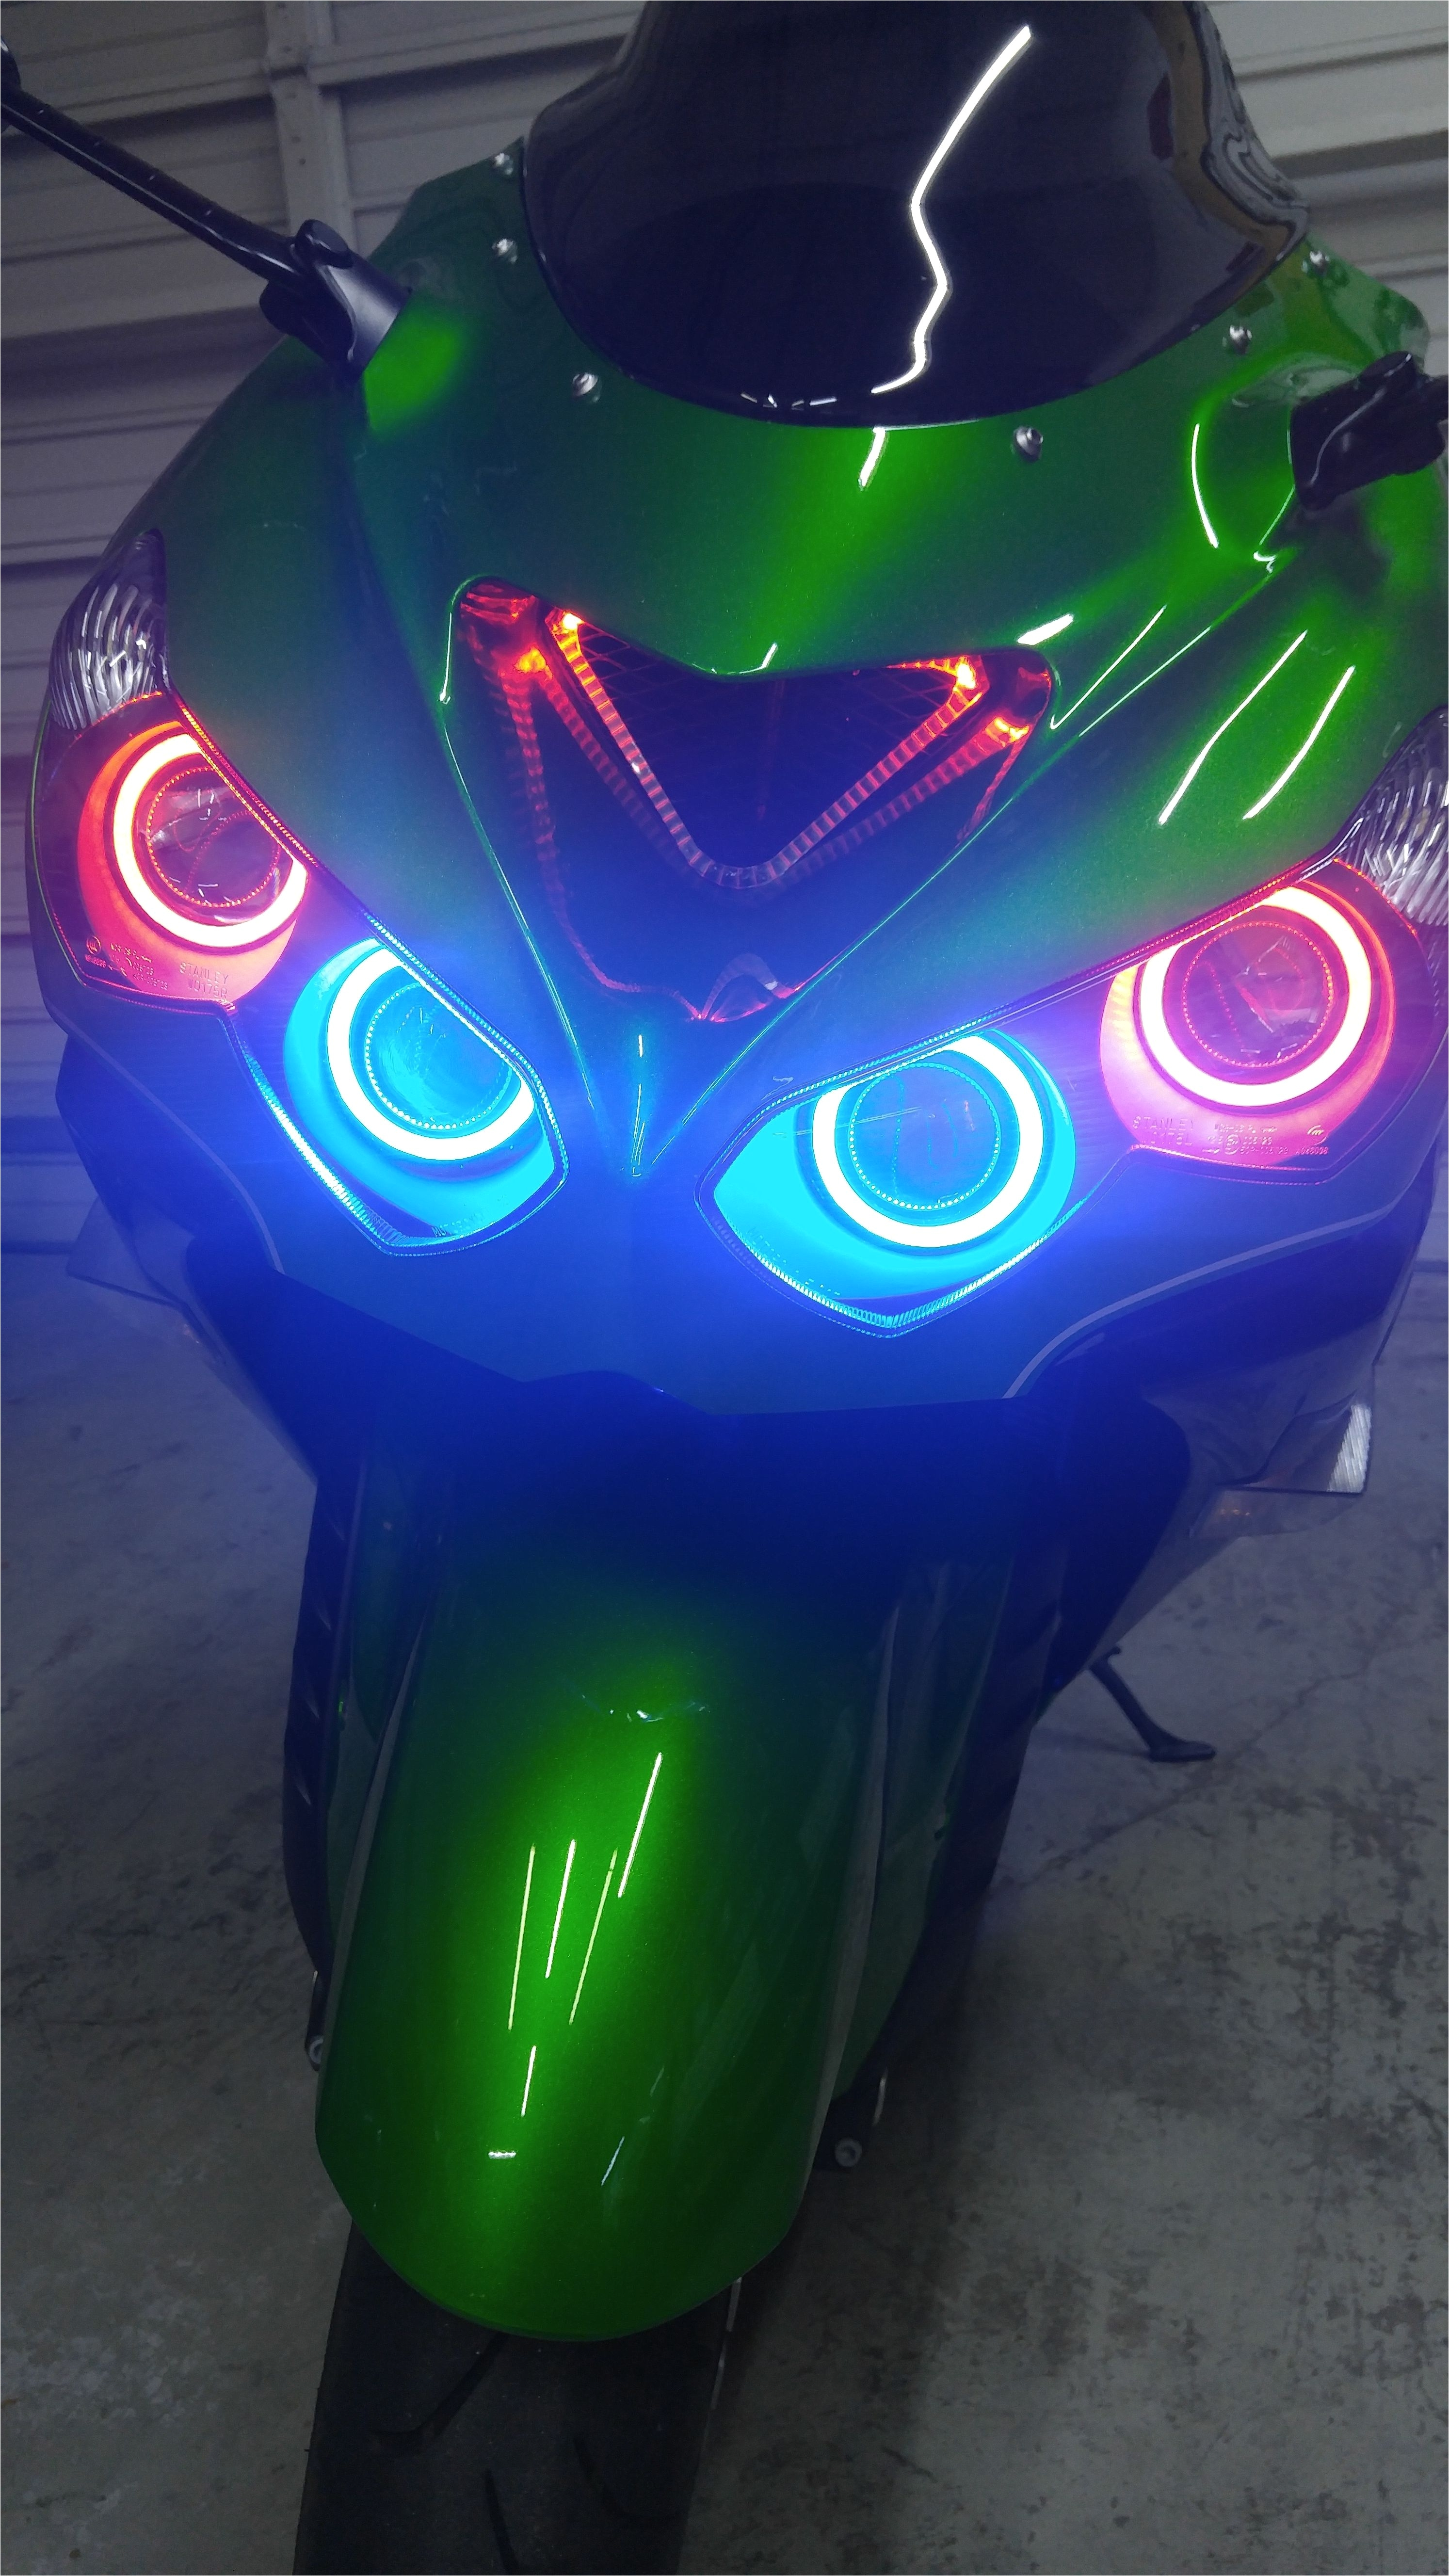 Trailer Lights Walmart Motorcycle Light Kit Near Me American Bathtub Refinishers